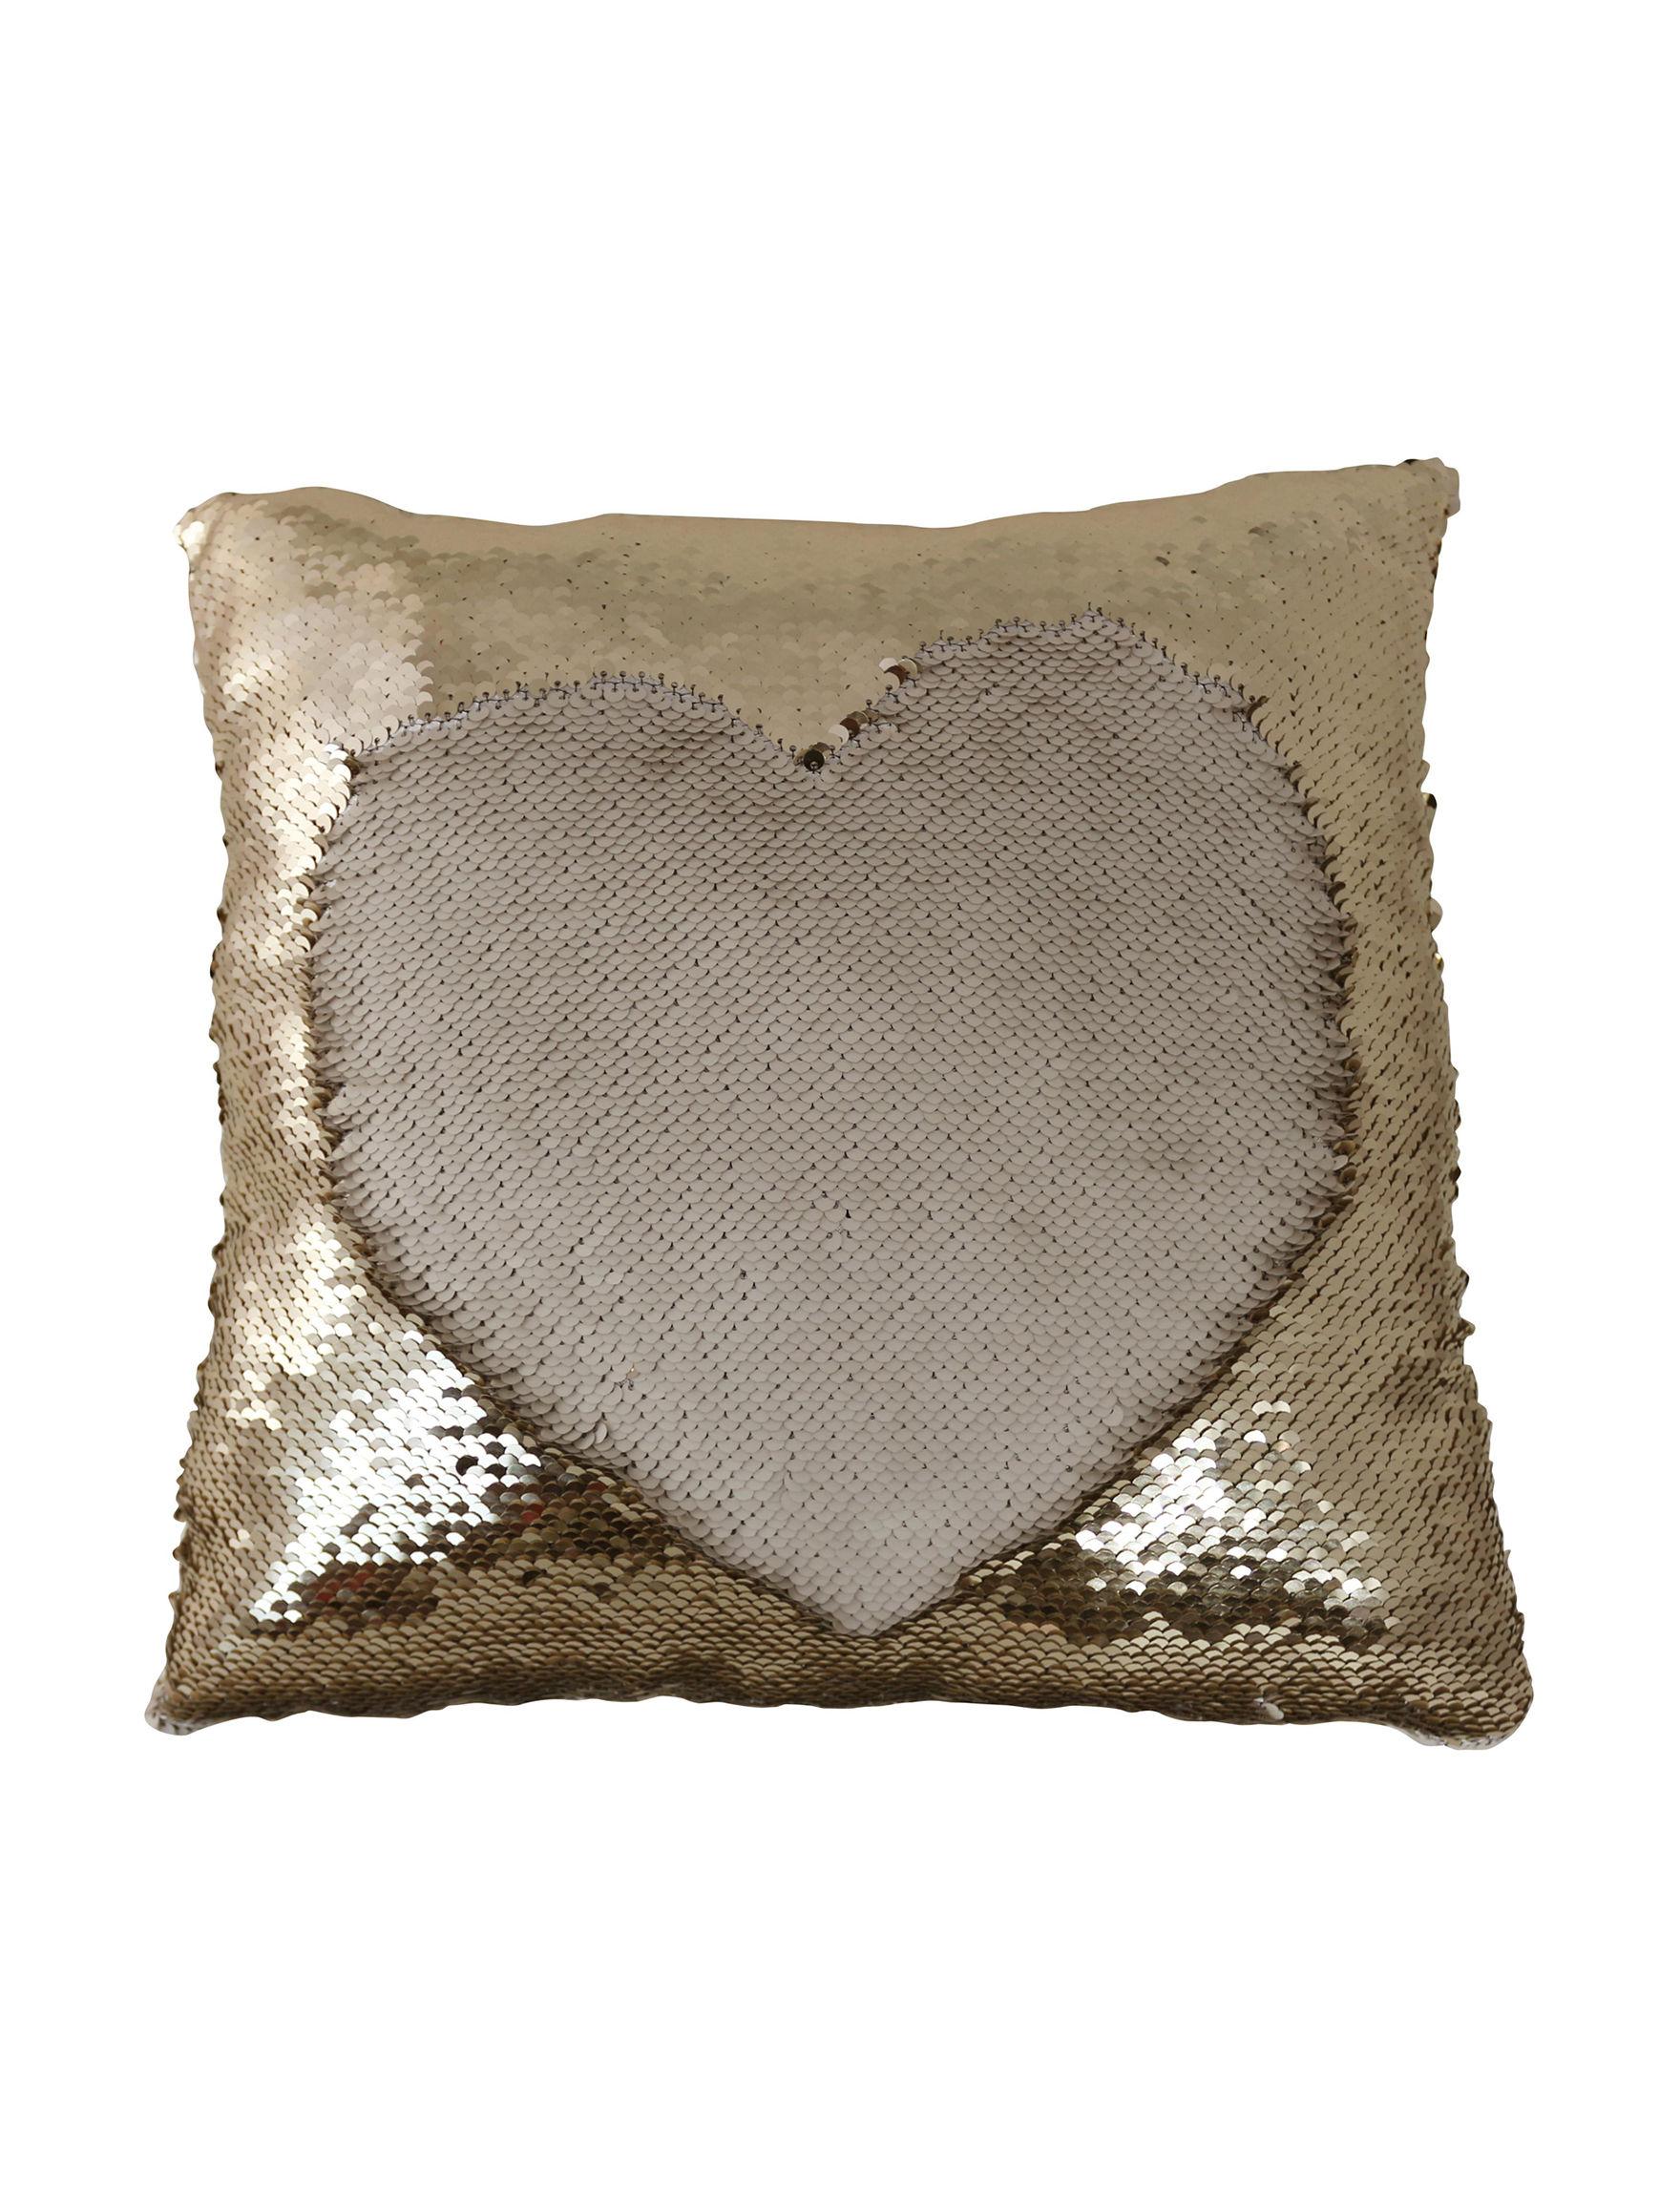 Grand Innovation Rose Gold Decorative Pillows